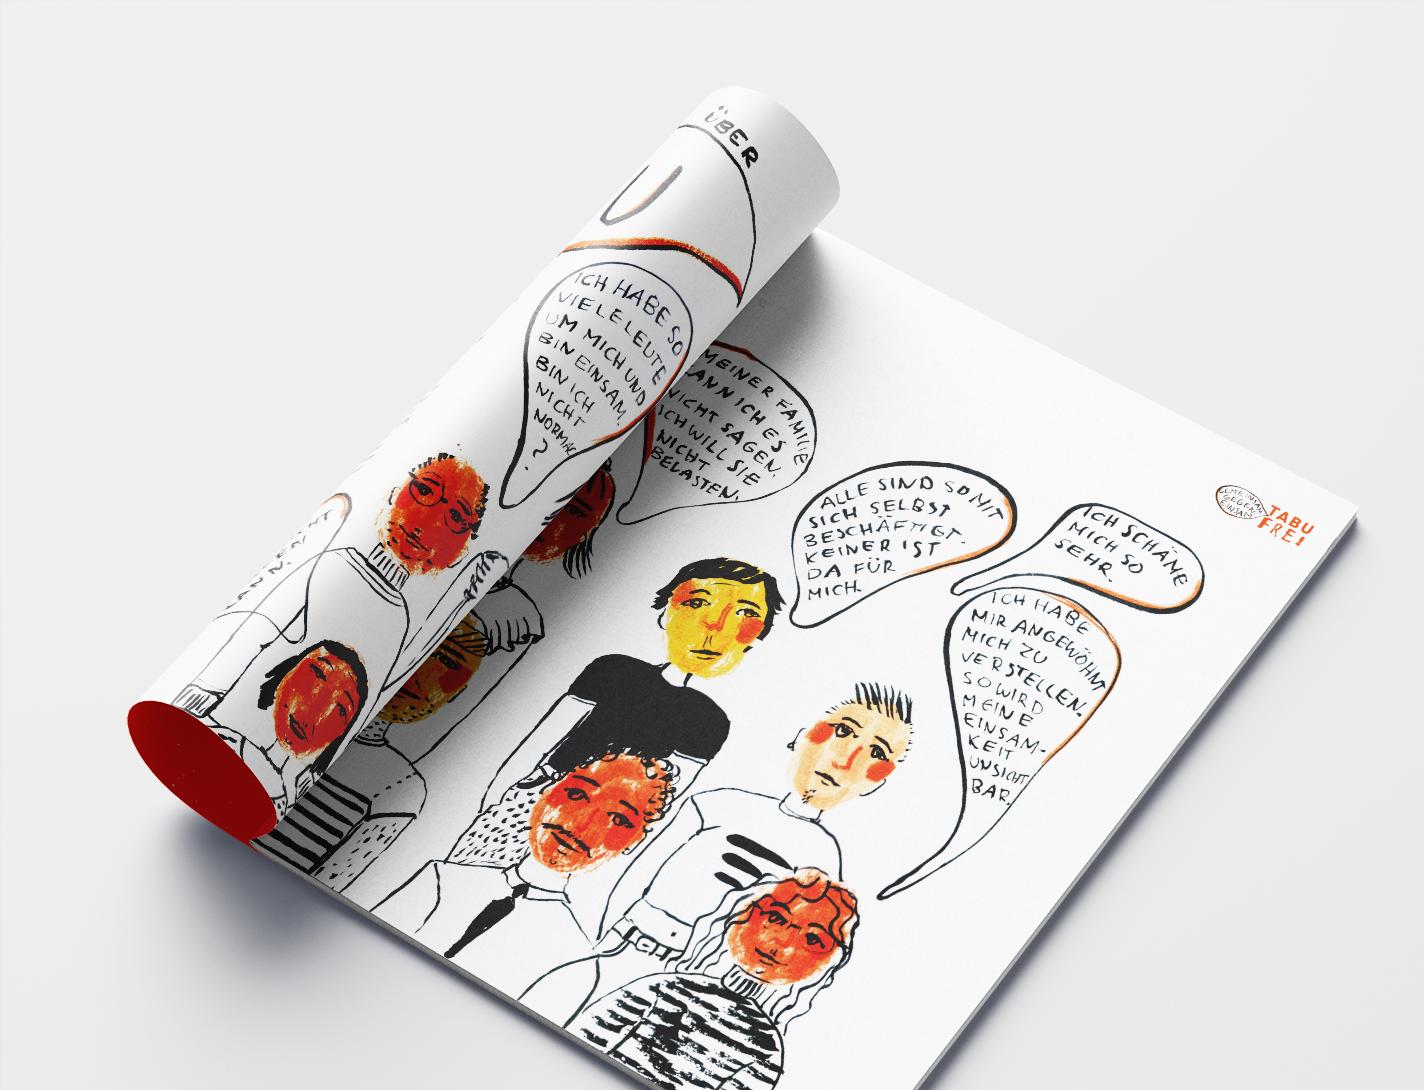 Editorial design and illustration